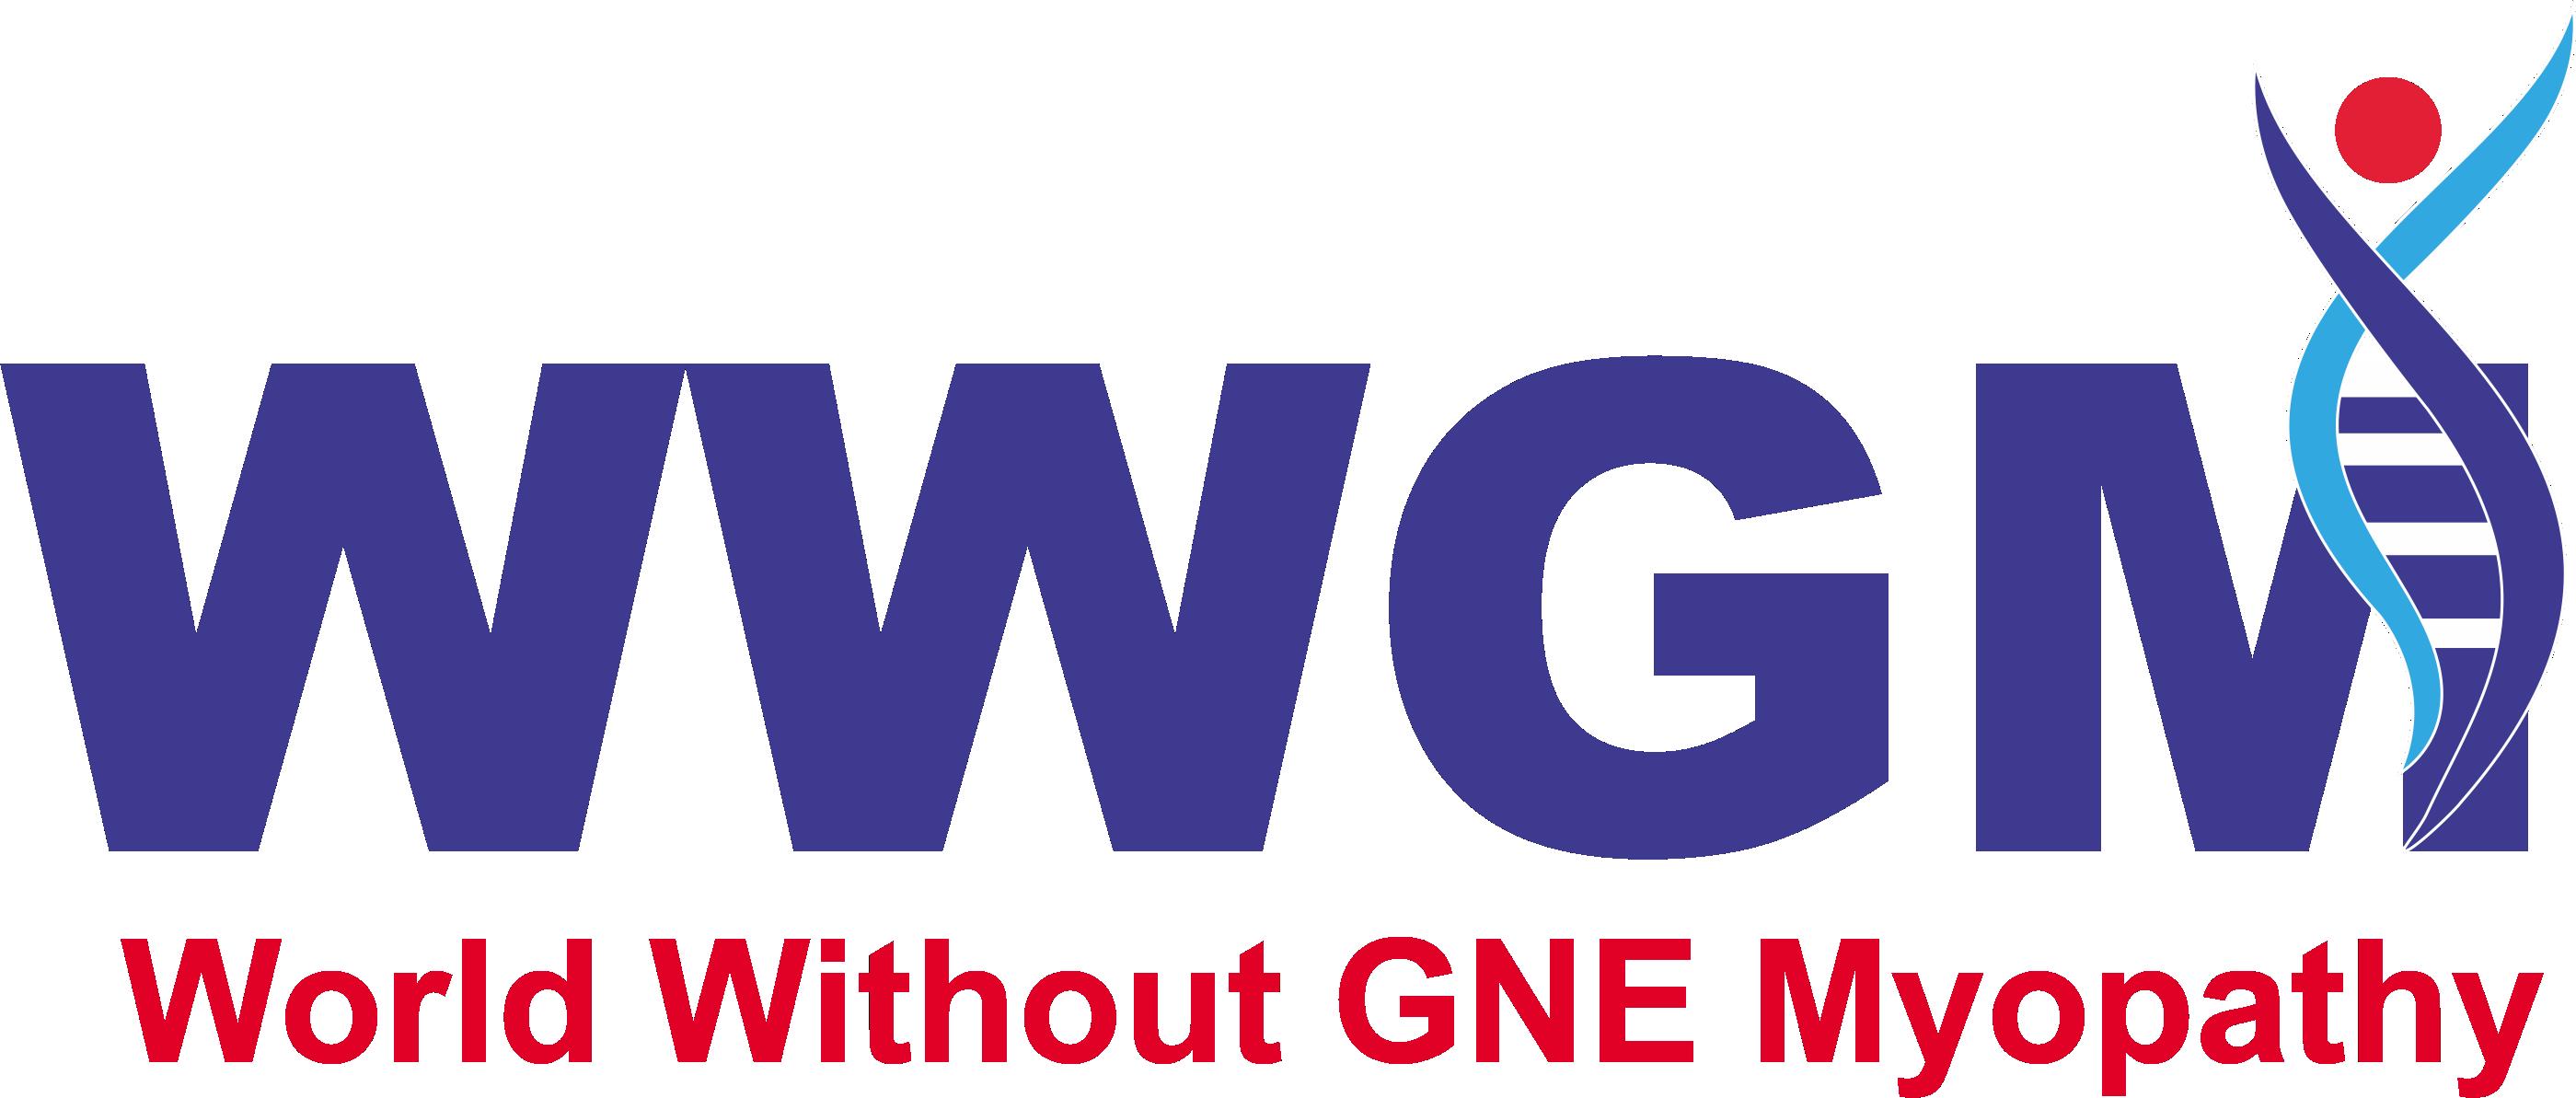 World Without GNE Myopathy